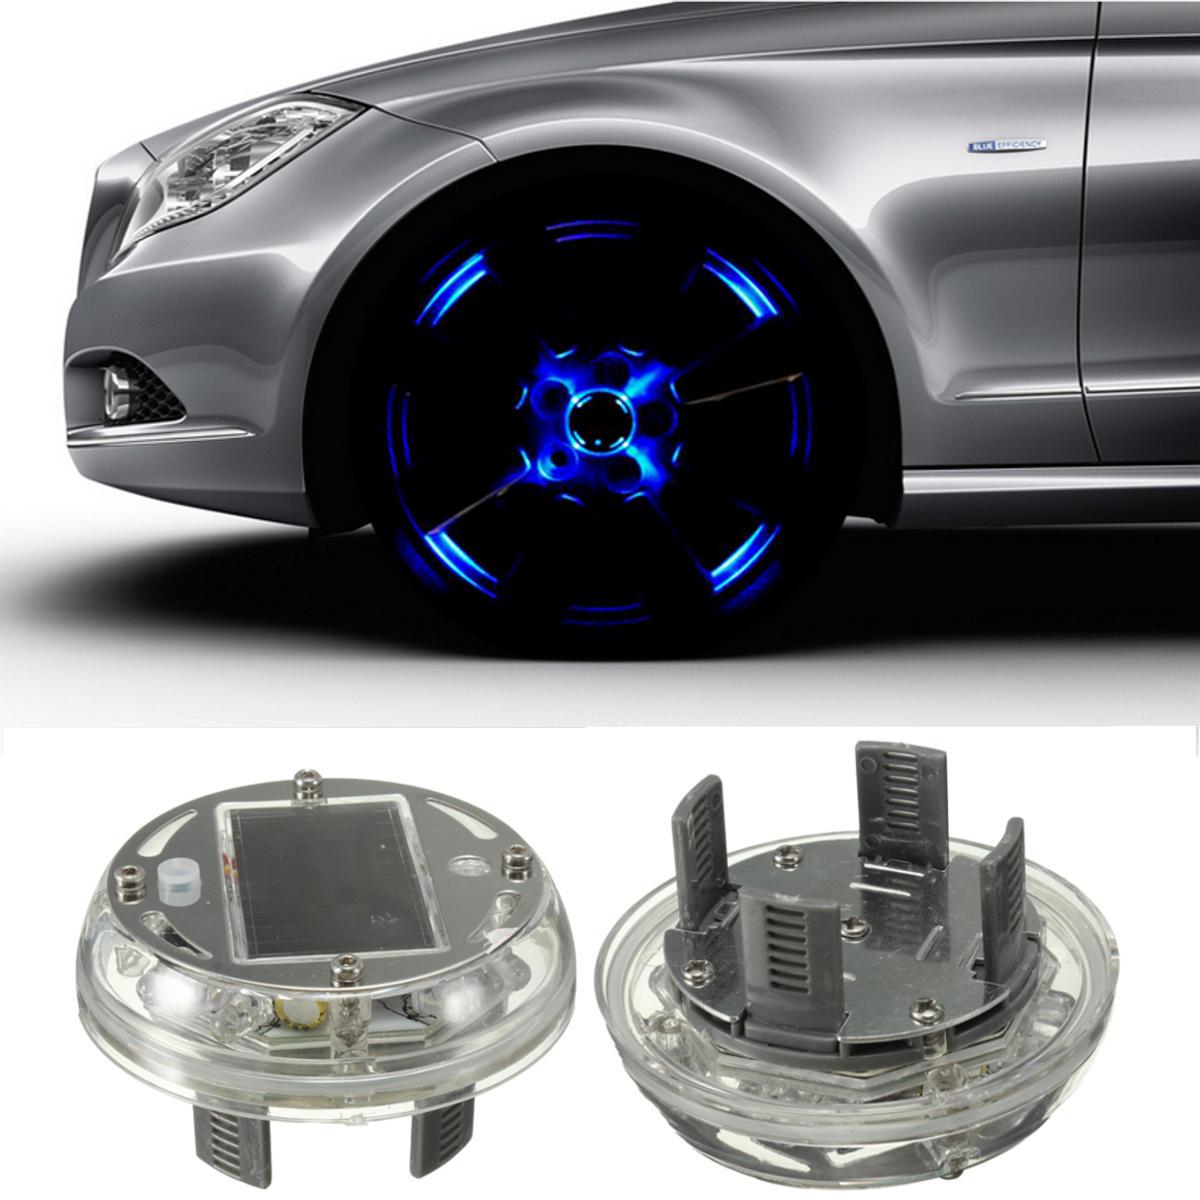 Solar Energy LED Car Wheel Tire Rim Flash Light Decoration Lamp 4 Flashing Modes